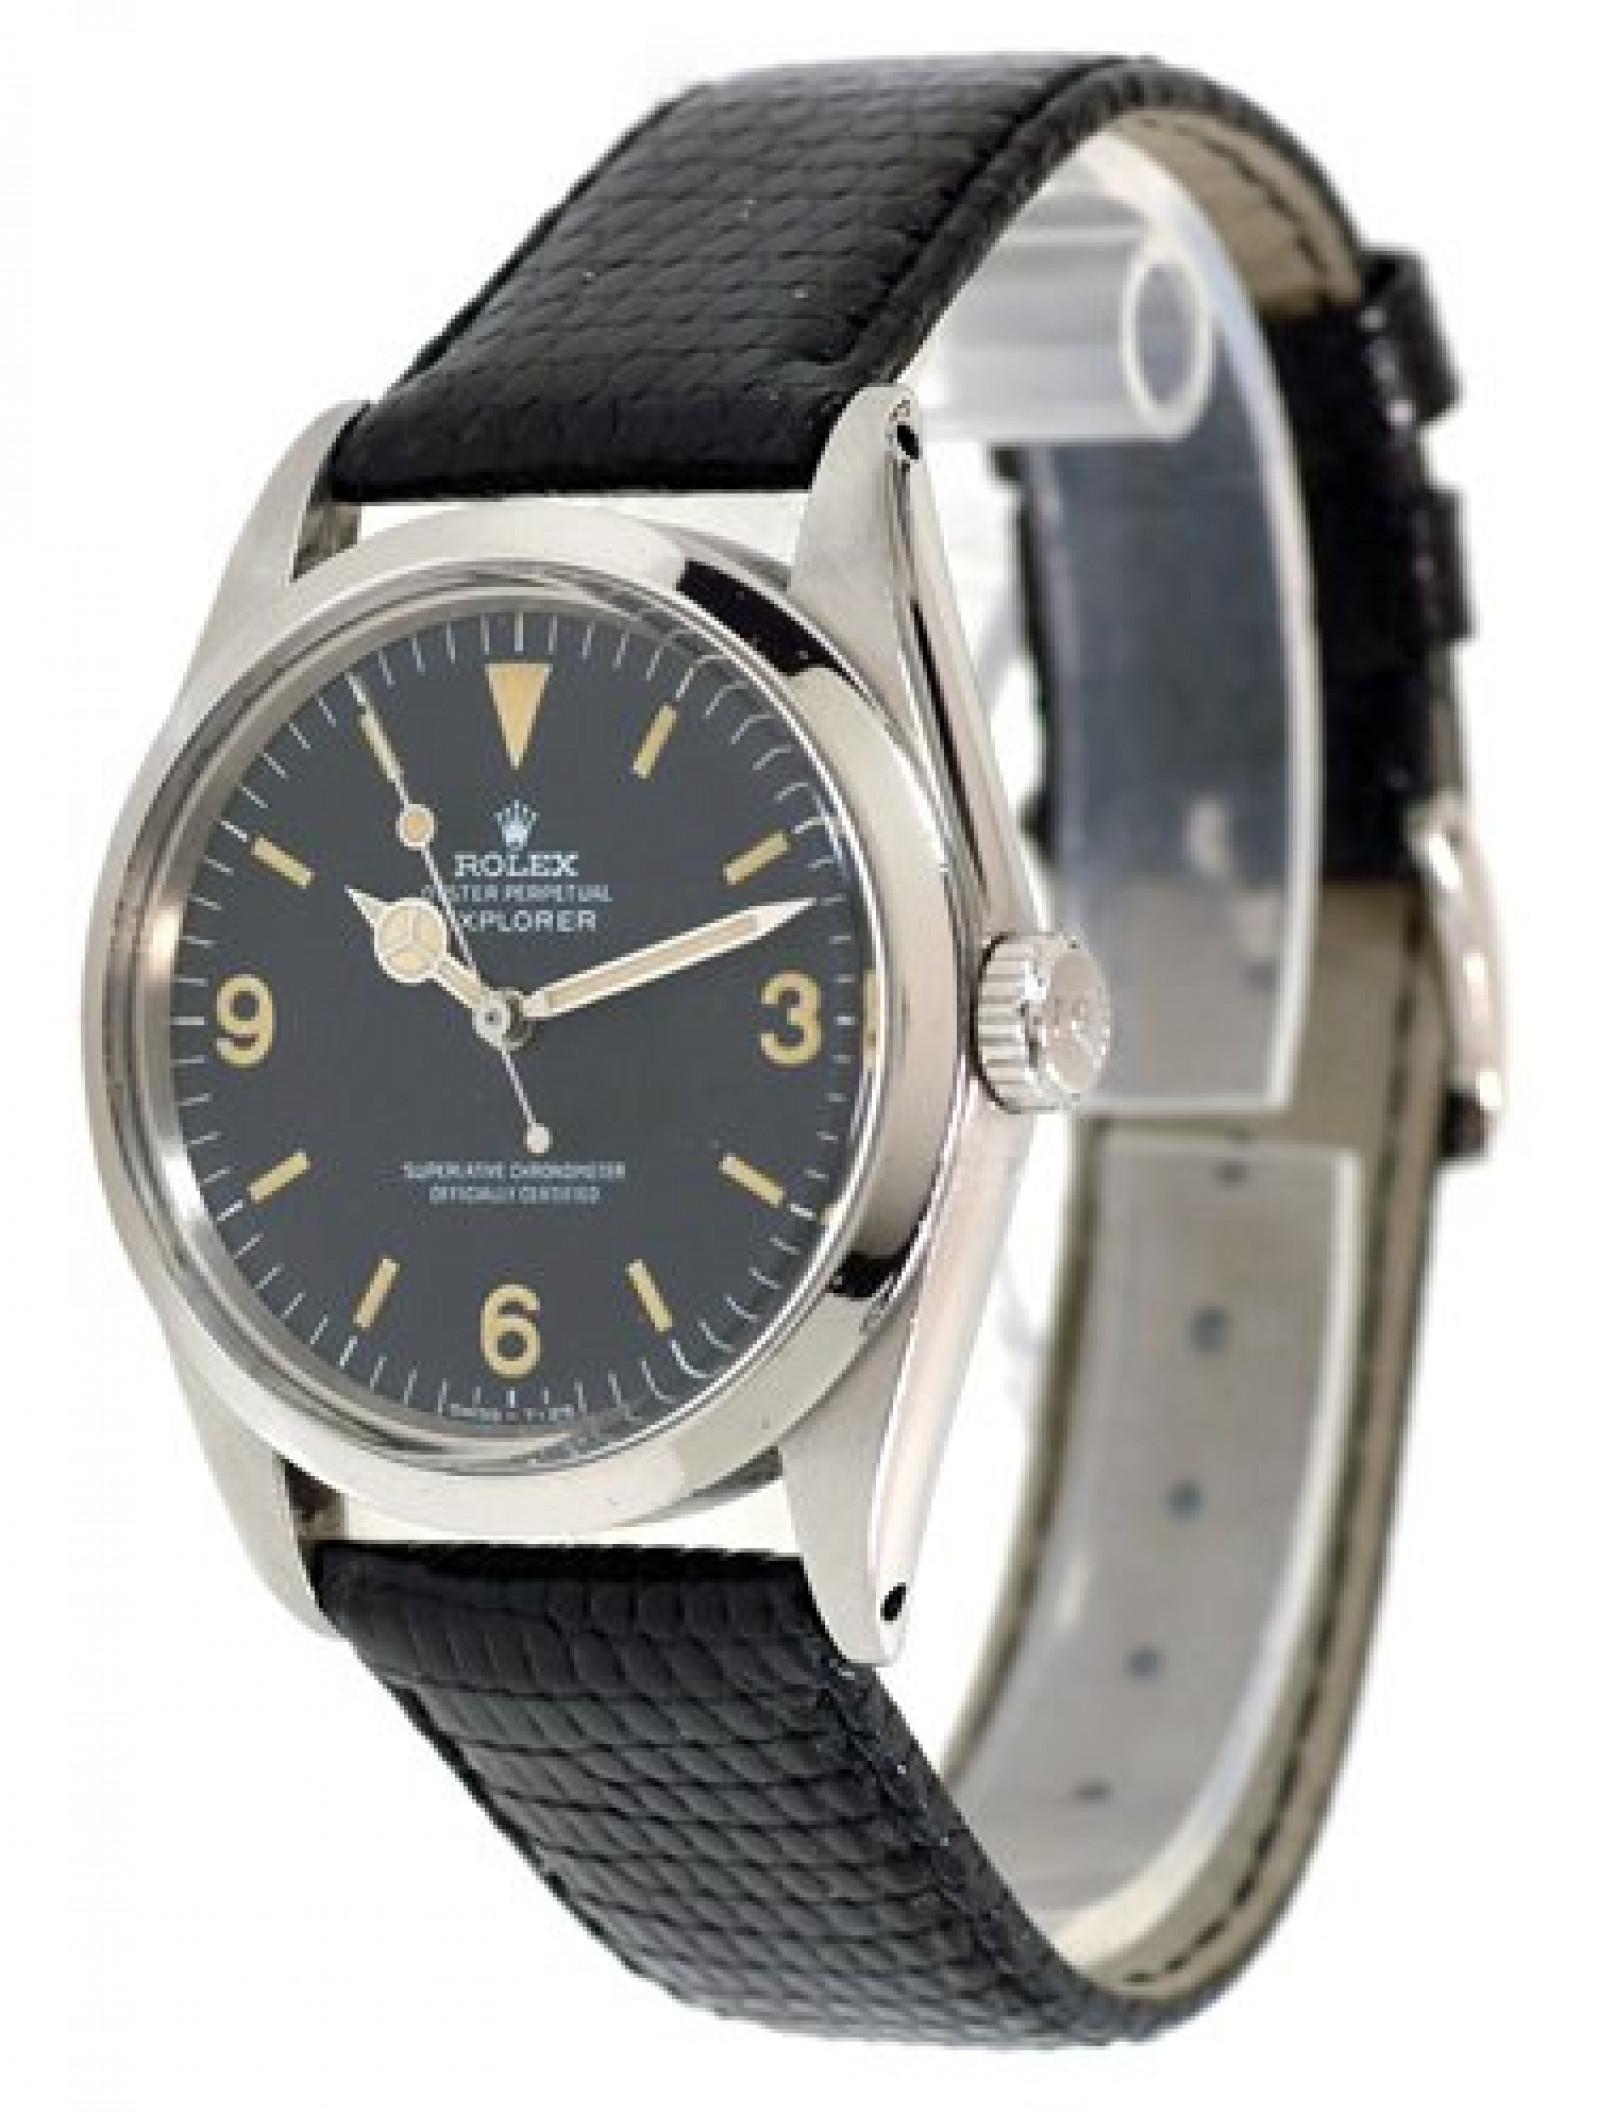 Vintage Rolex Explorer 1016 Steel with Black Dial 1970